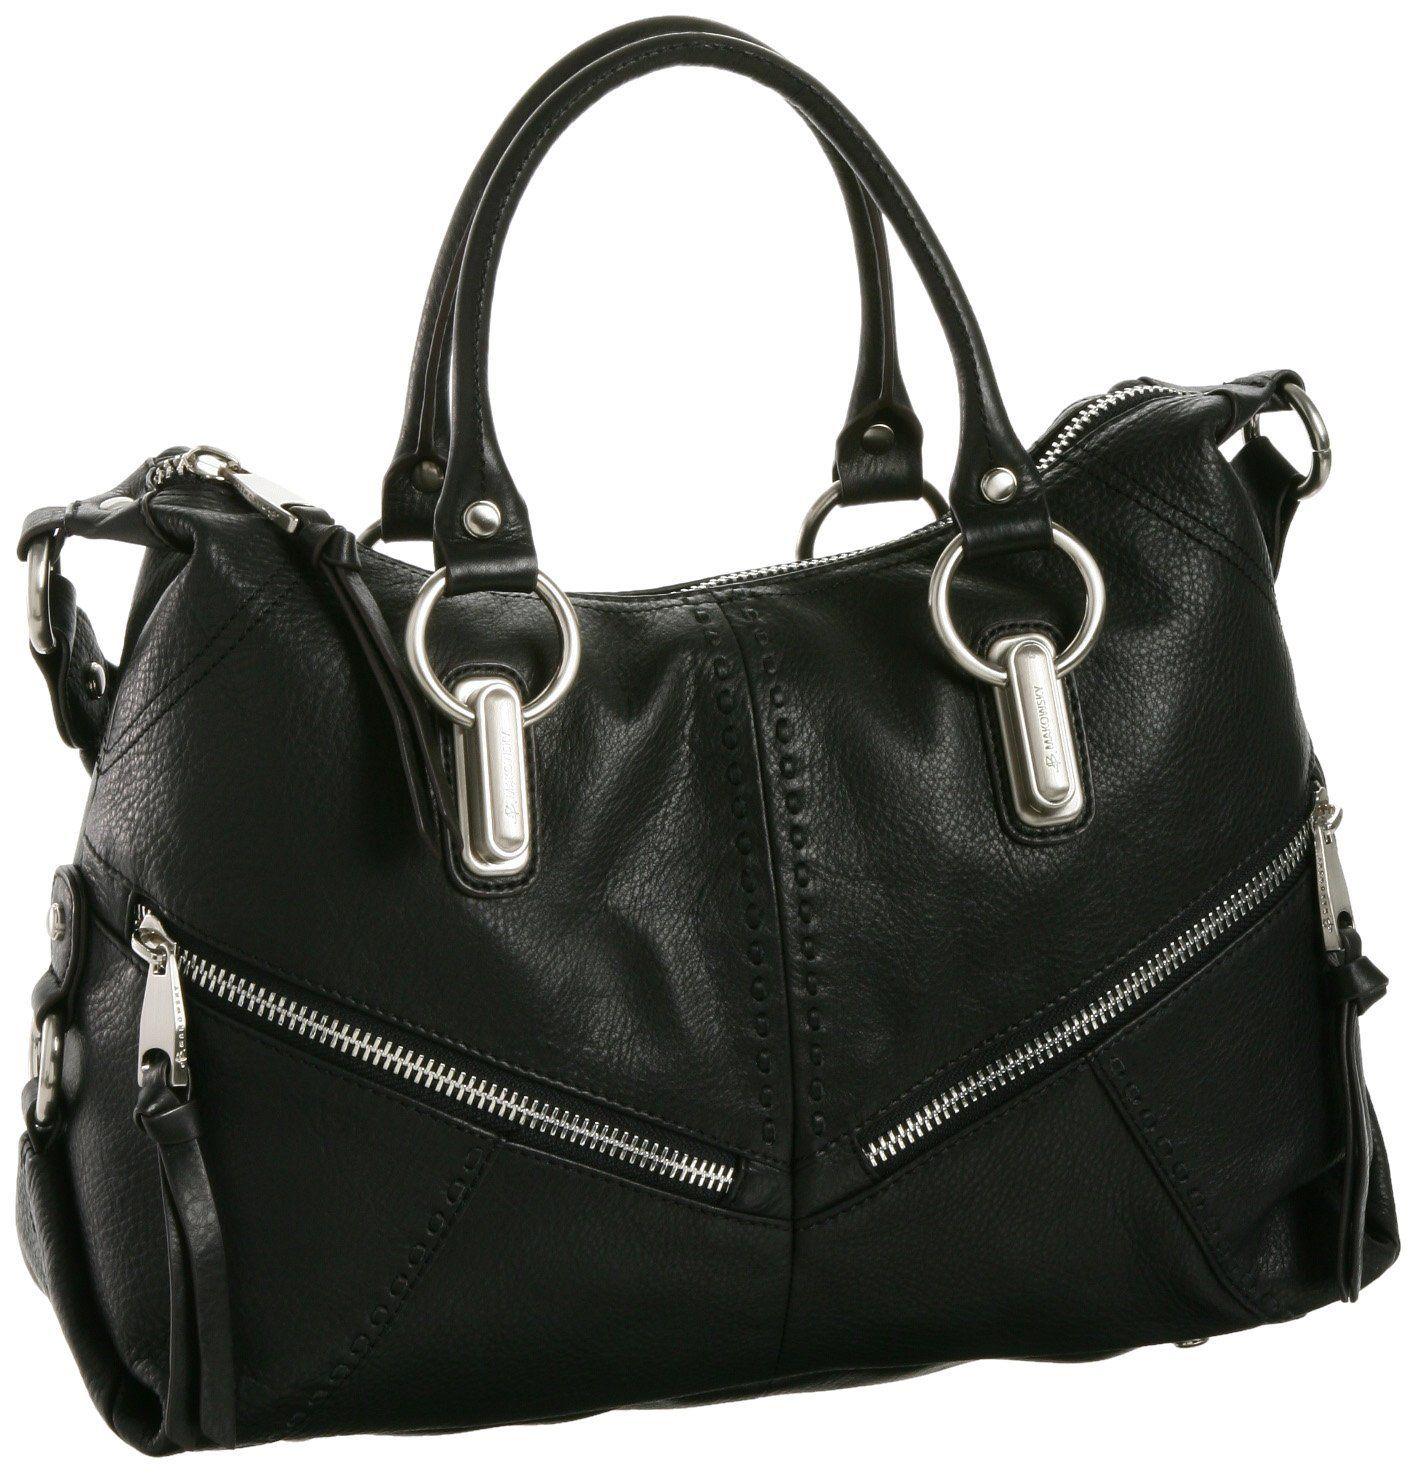 B Makowsky Handbags Wallets Women Clothing